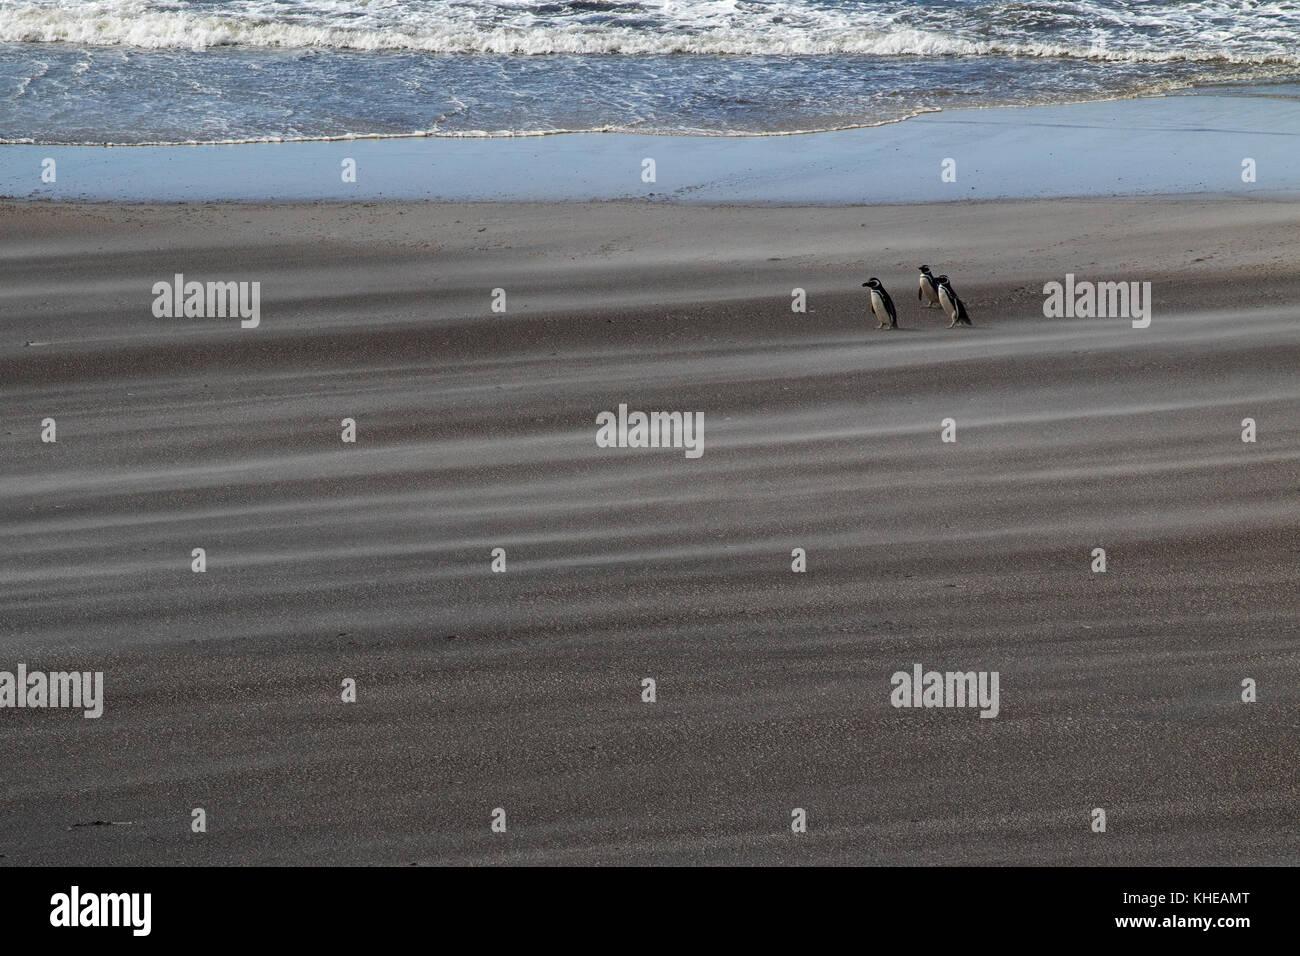 Magellanic penguin Spheniscus magellanicus adults on wind blown beach Saunders Island Falkland Islands British Overseas Territory November 2016 Stock Photo